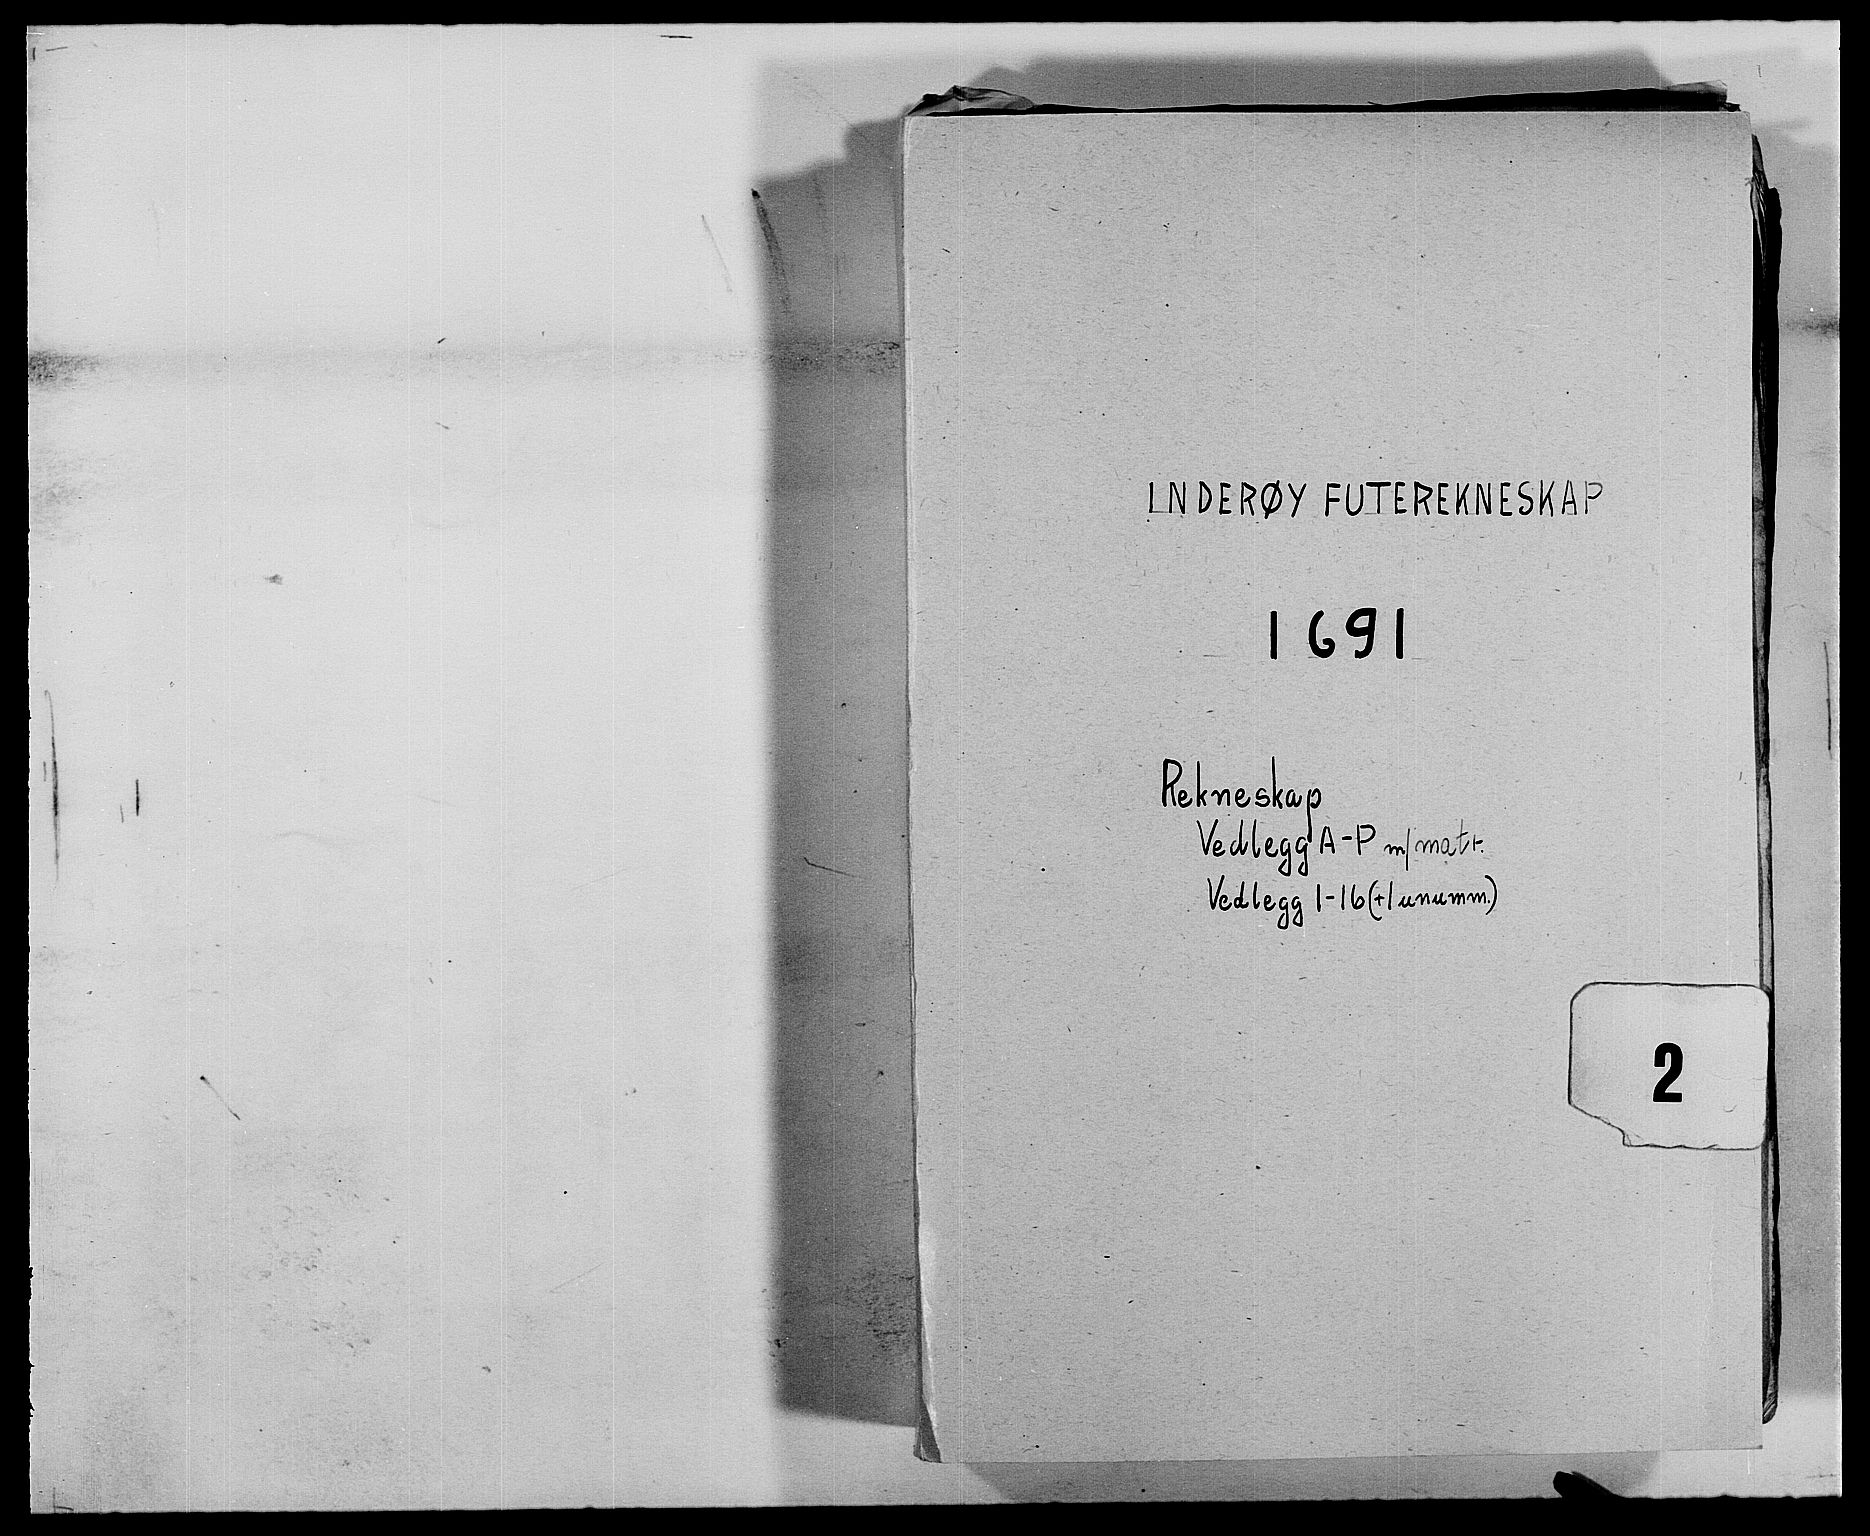 RA, Rentekammeret inntil 1814, Reviderte regnskaper, Fogderegnskap, R63/L4307: Fogderegnskap Inderøy, 1690-1691, s. 224